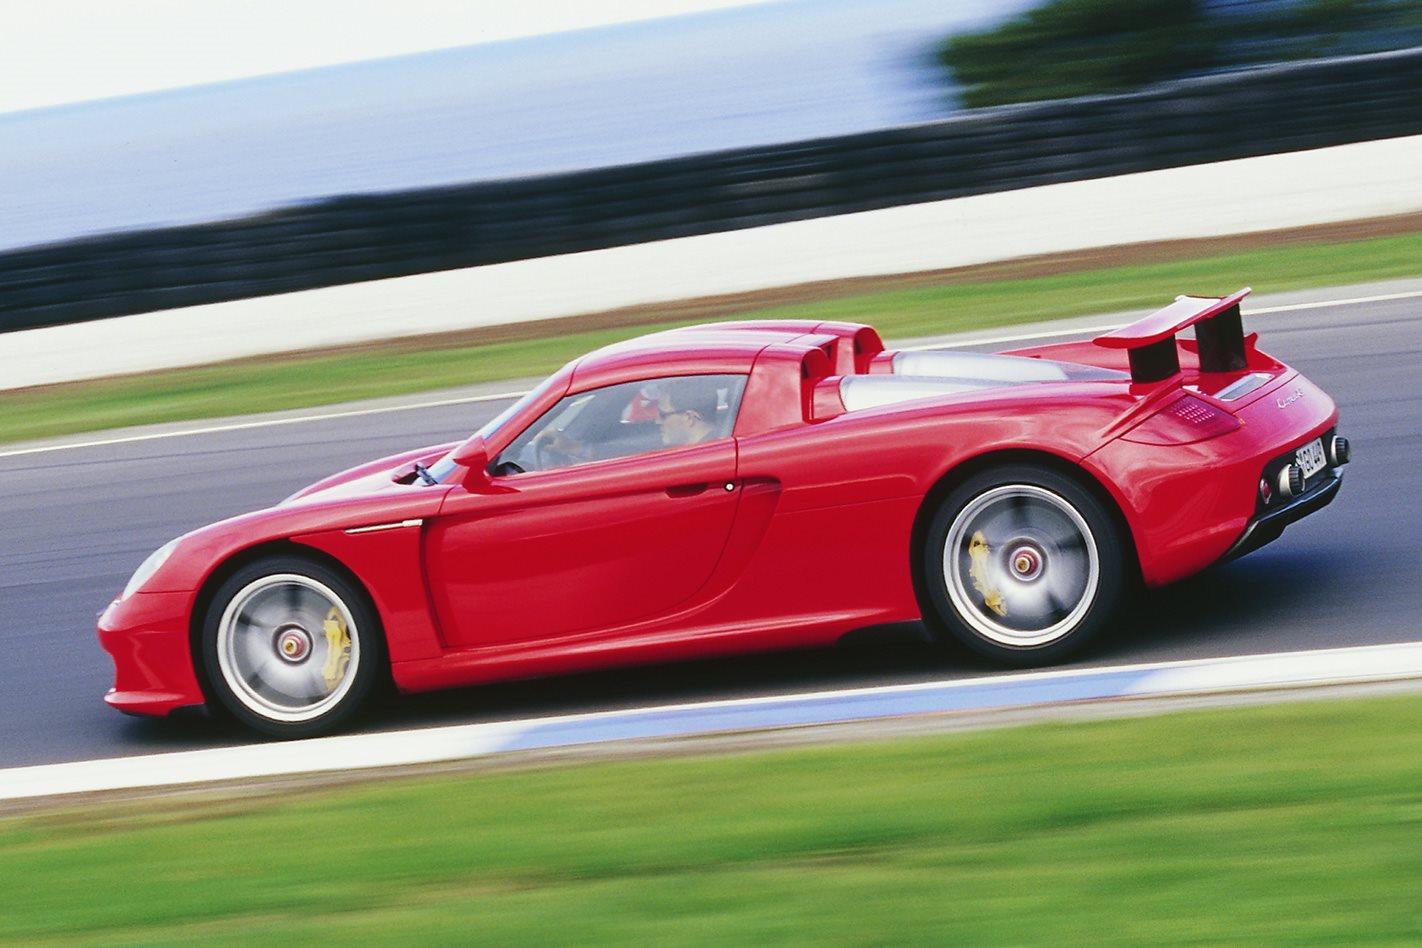 2004 Porsche Carrera GT exterior